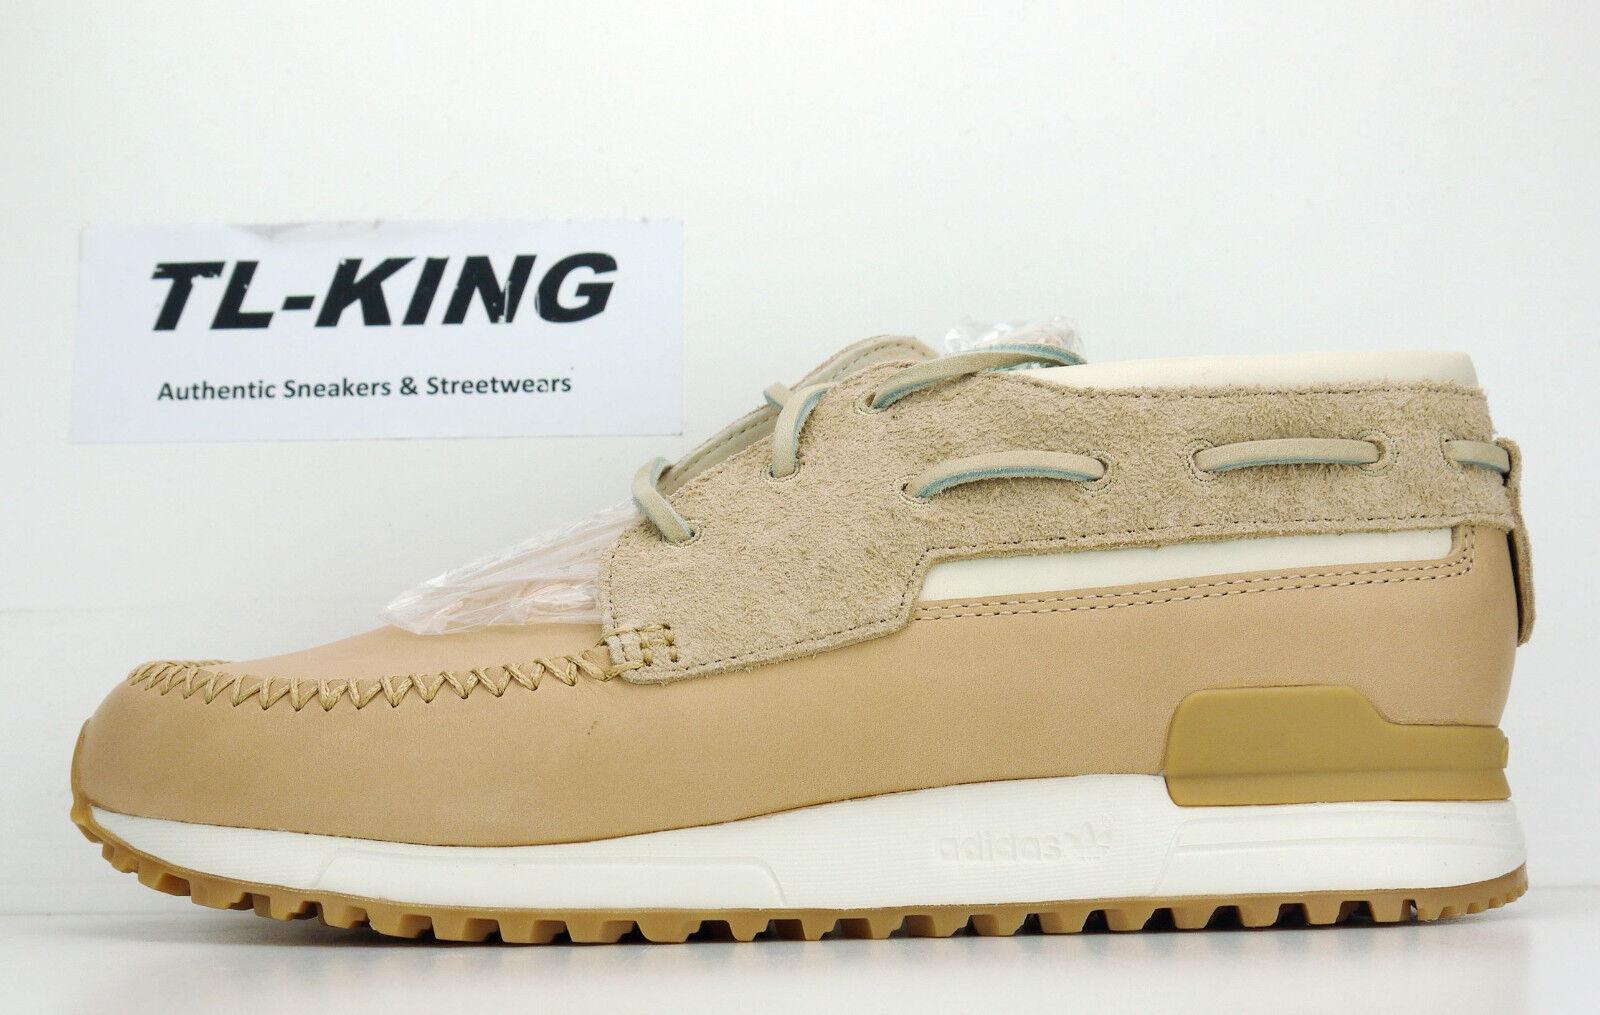 Adidas Consortium x END Clothing ZX 700 Boat Tan Chalk White Gum B39341 GC